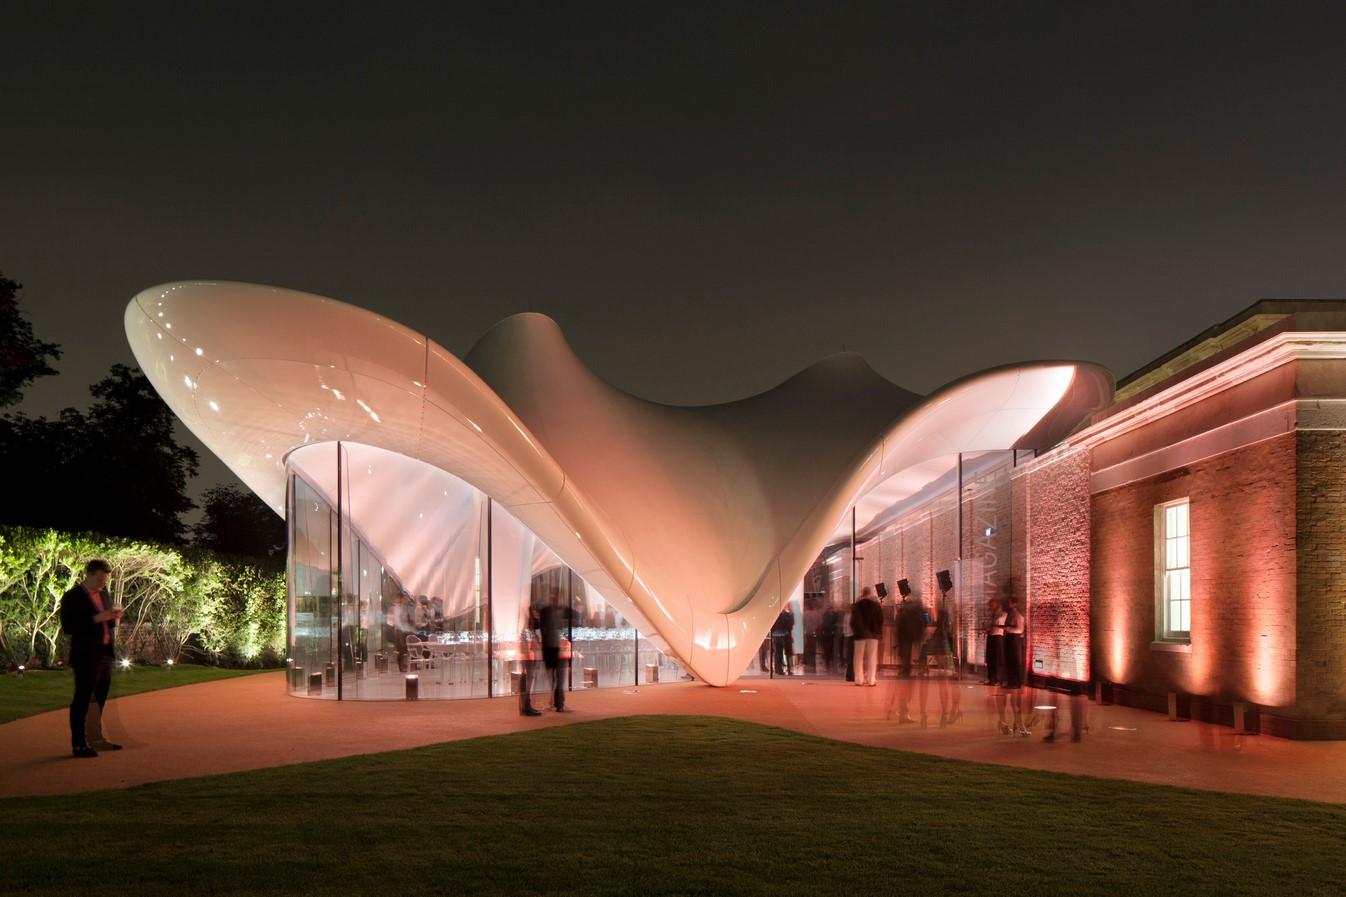 2016 Serpentine Pavilion by BIG: The unzipped walls - Sheet2